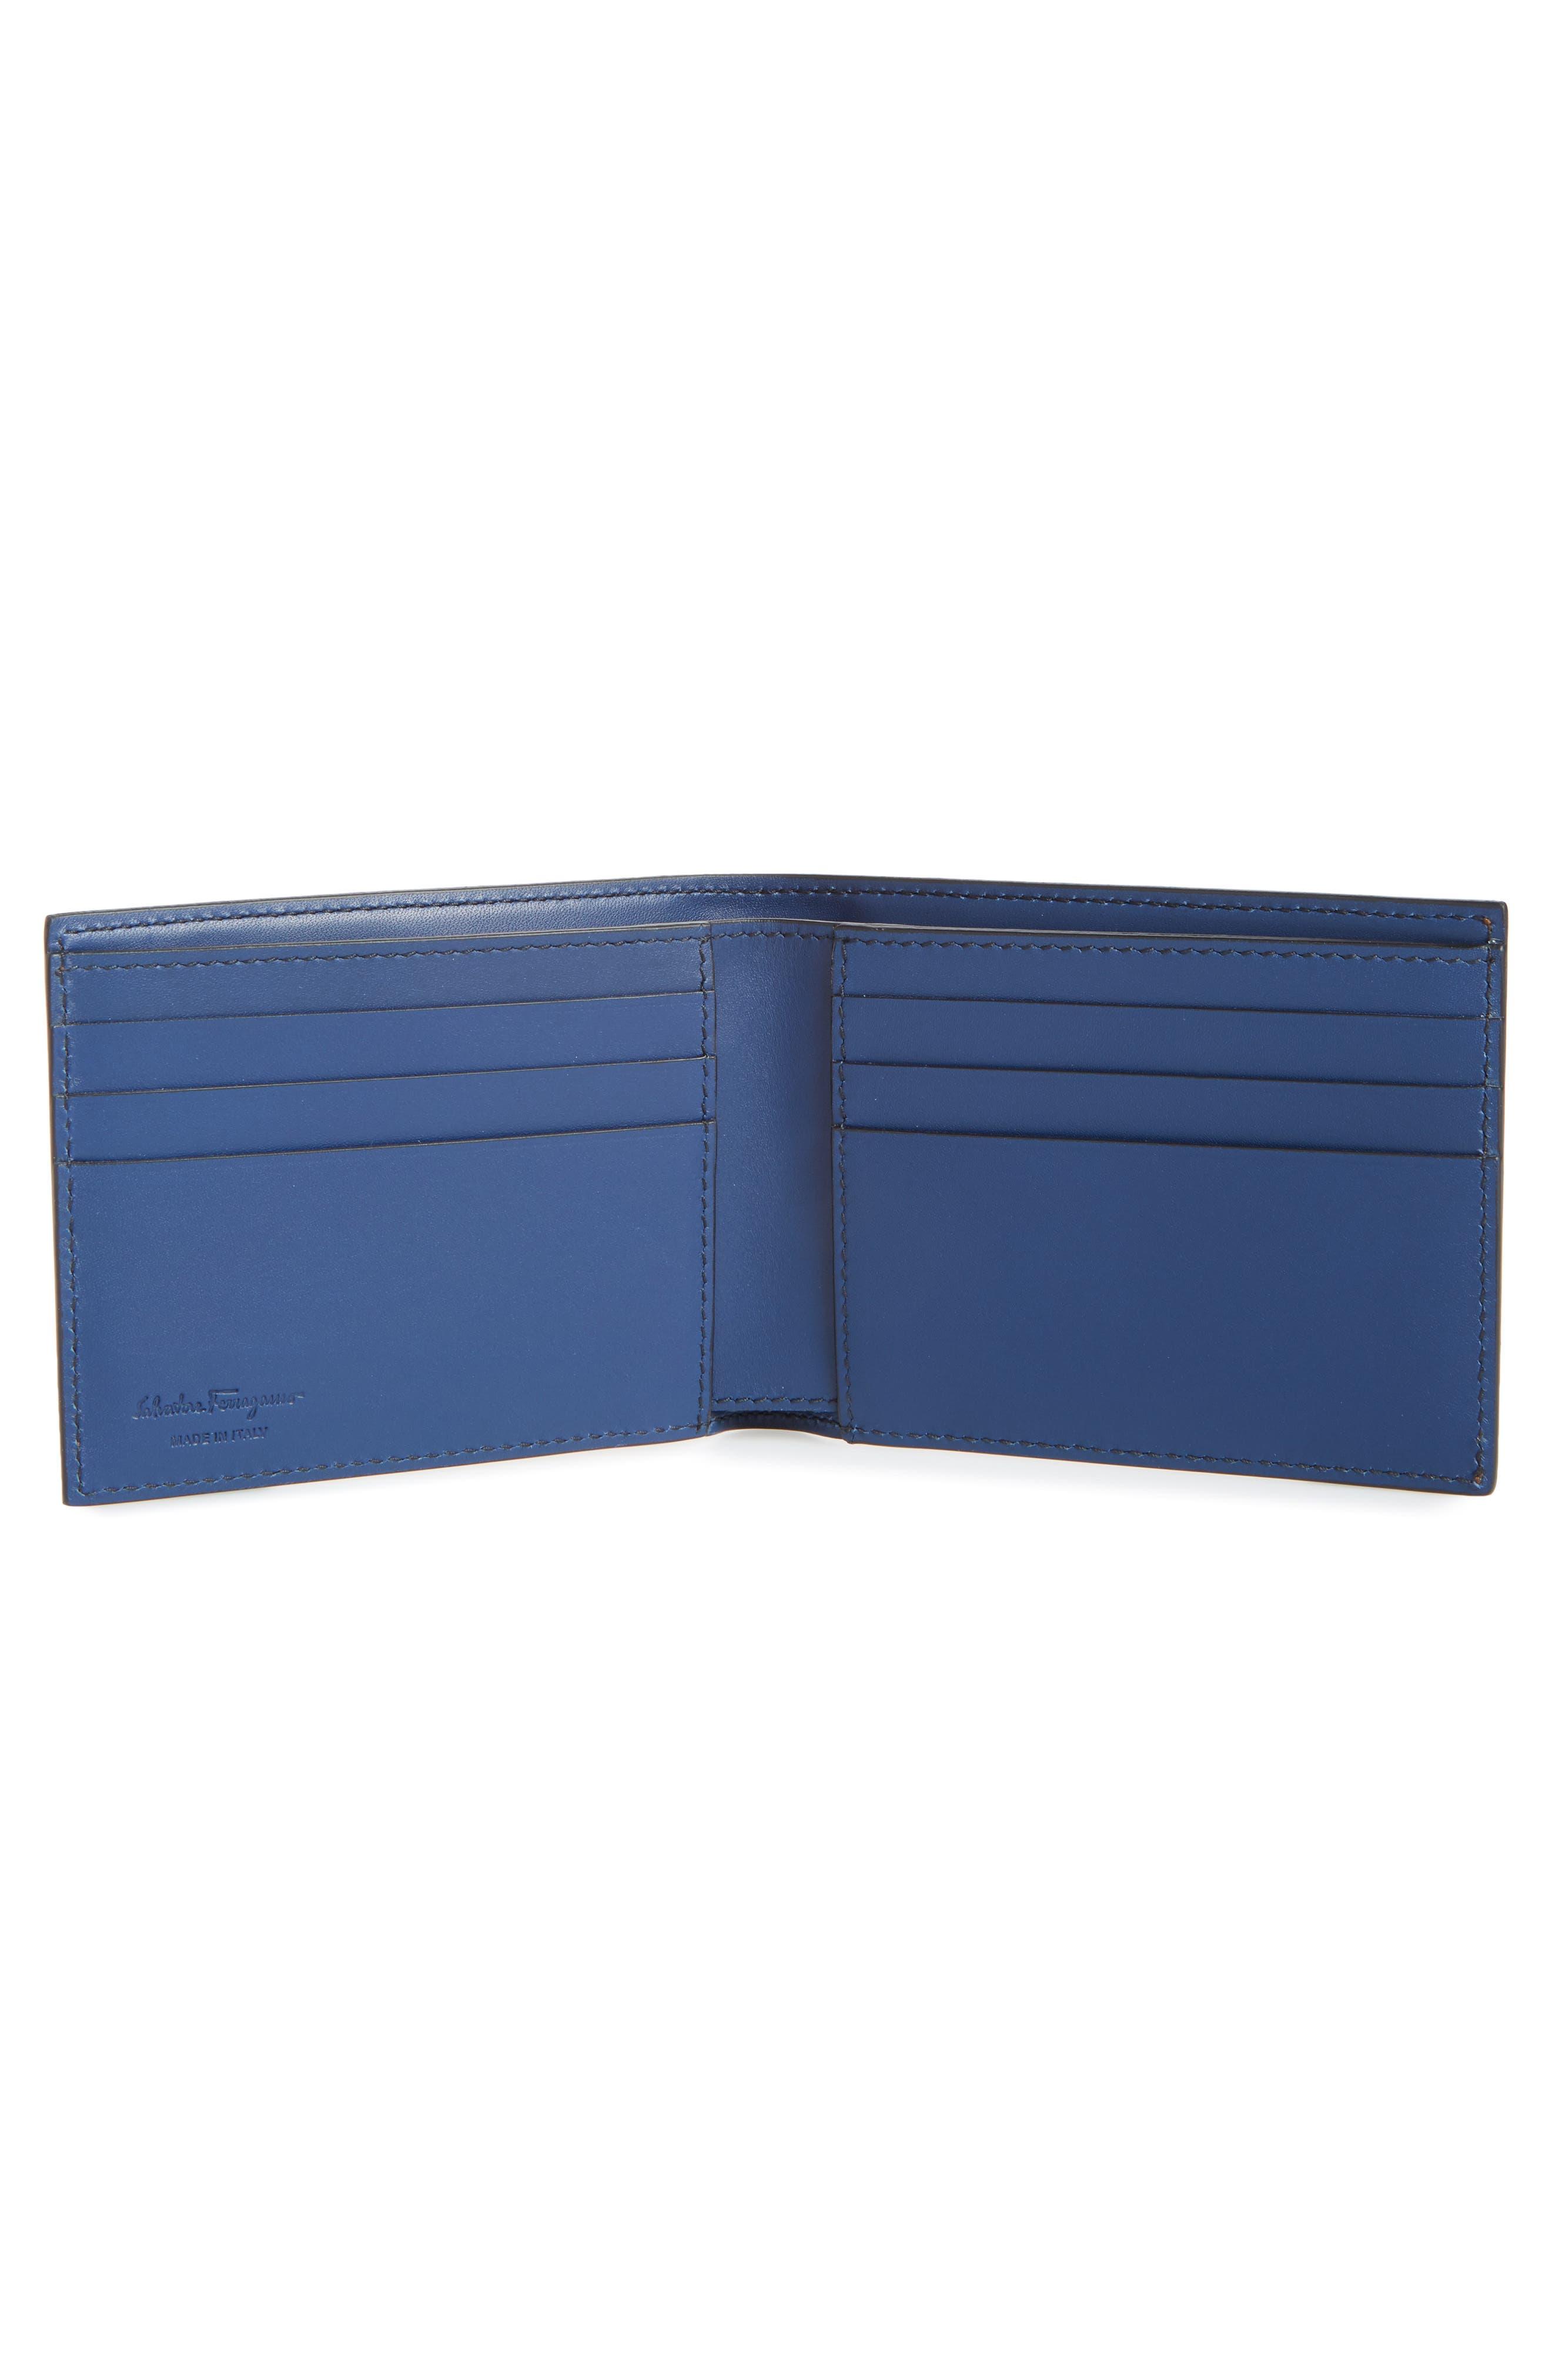 Calfskin Leather Bifold Wallet,                             Alternate thumbnail 2, color,                             Radica